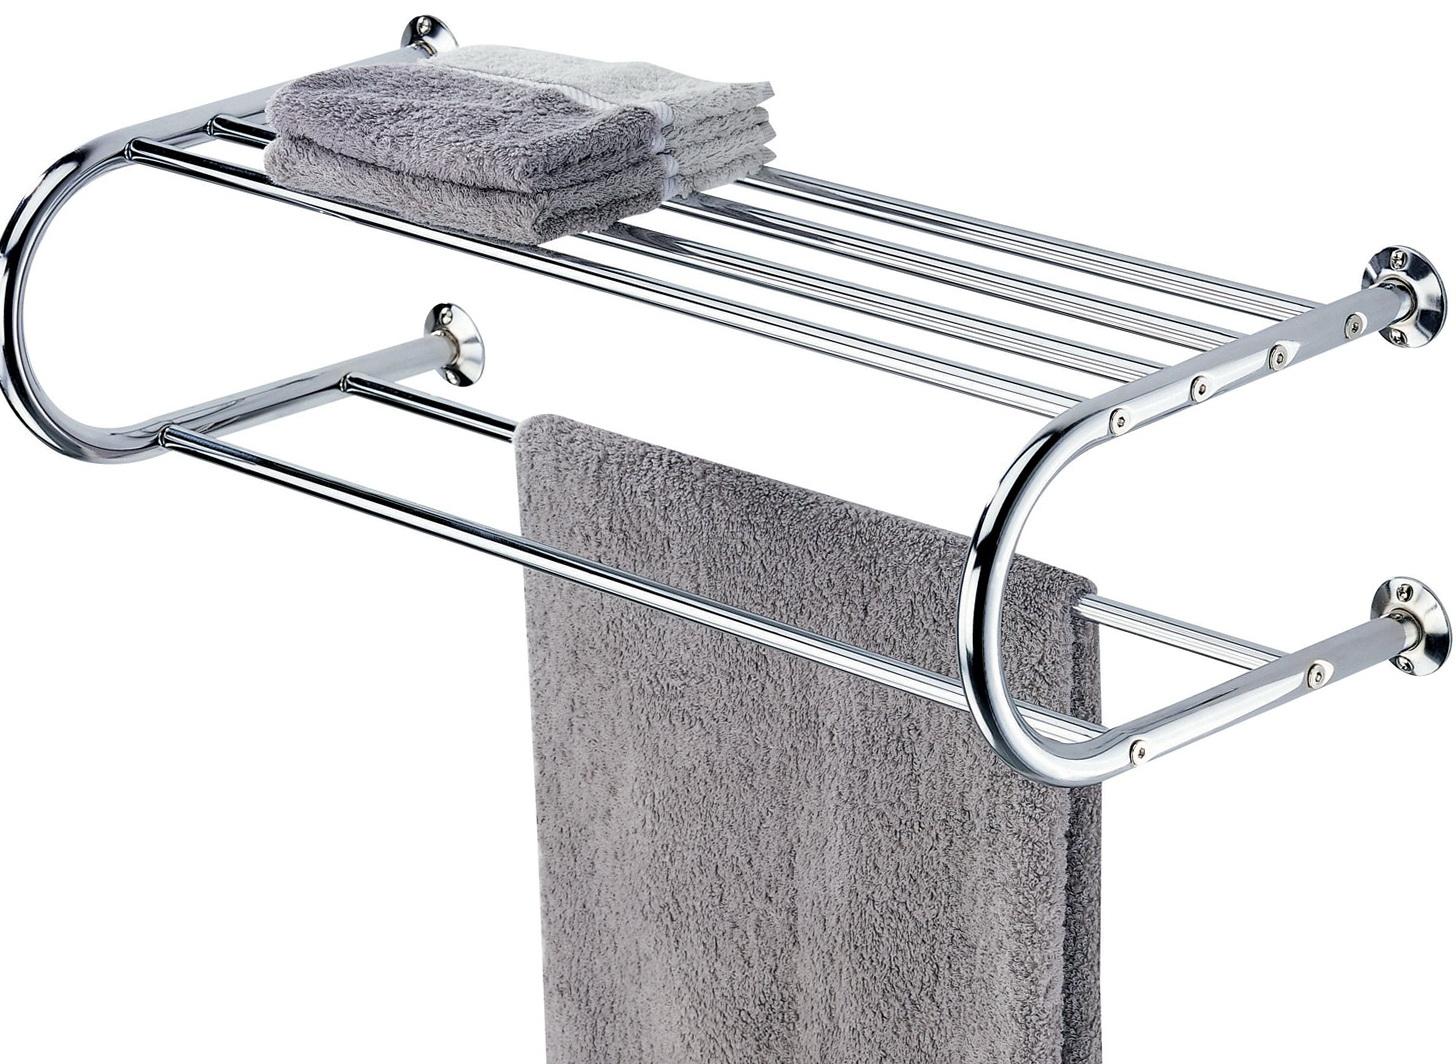 Bathroom wall shelf with towel bar